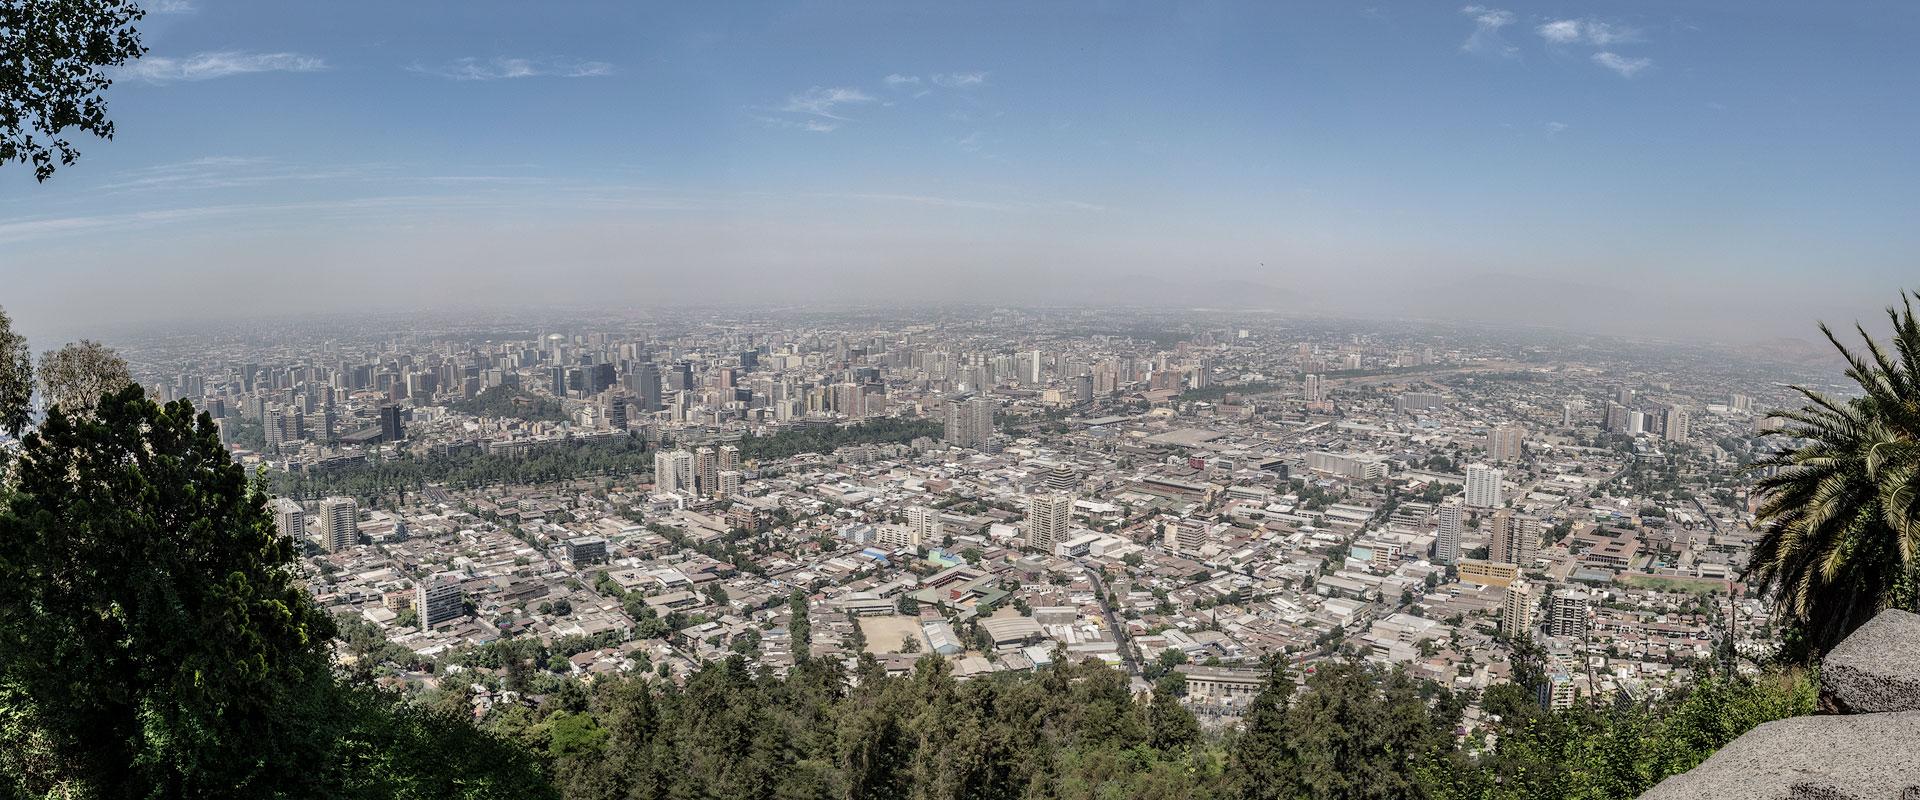 Panorama-Santiago-de-Chile-1920x800-1